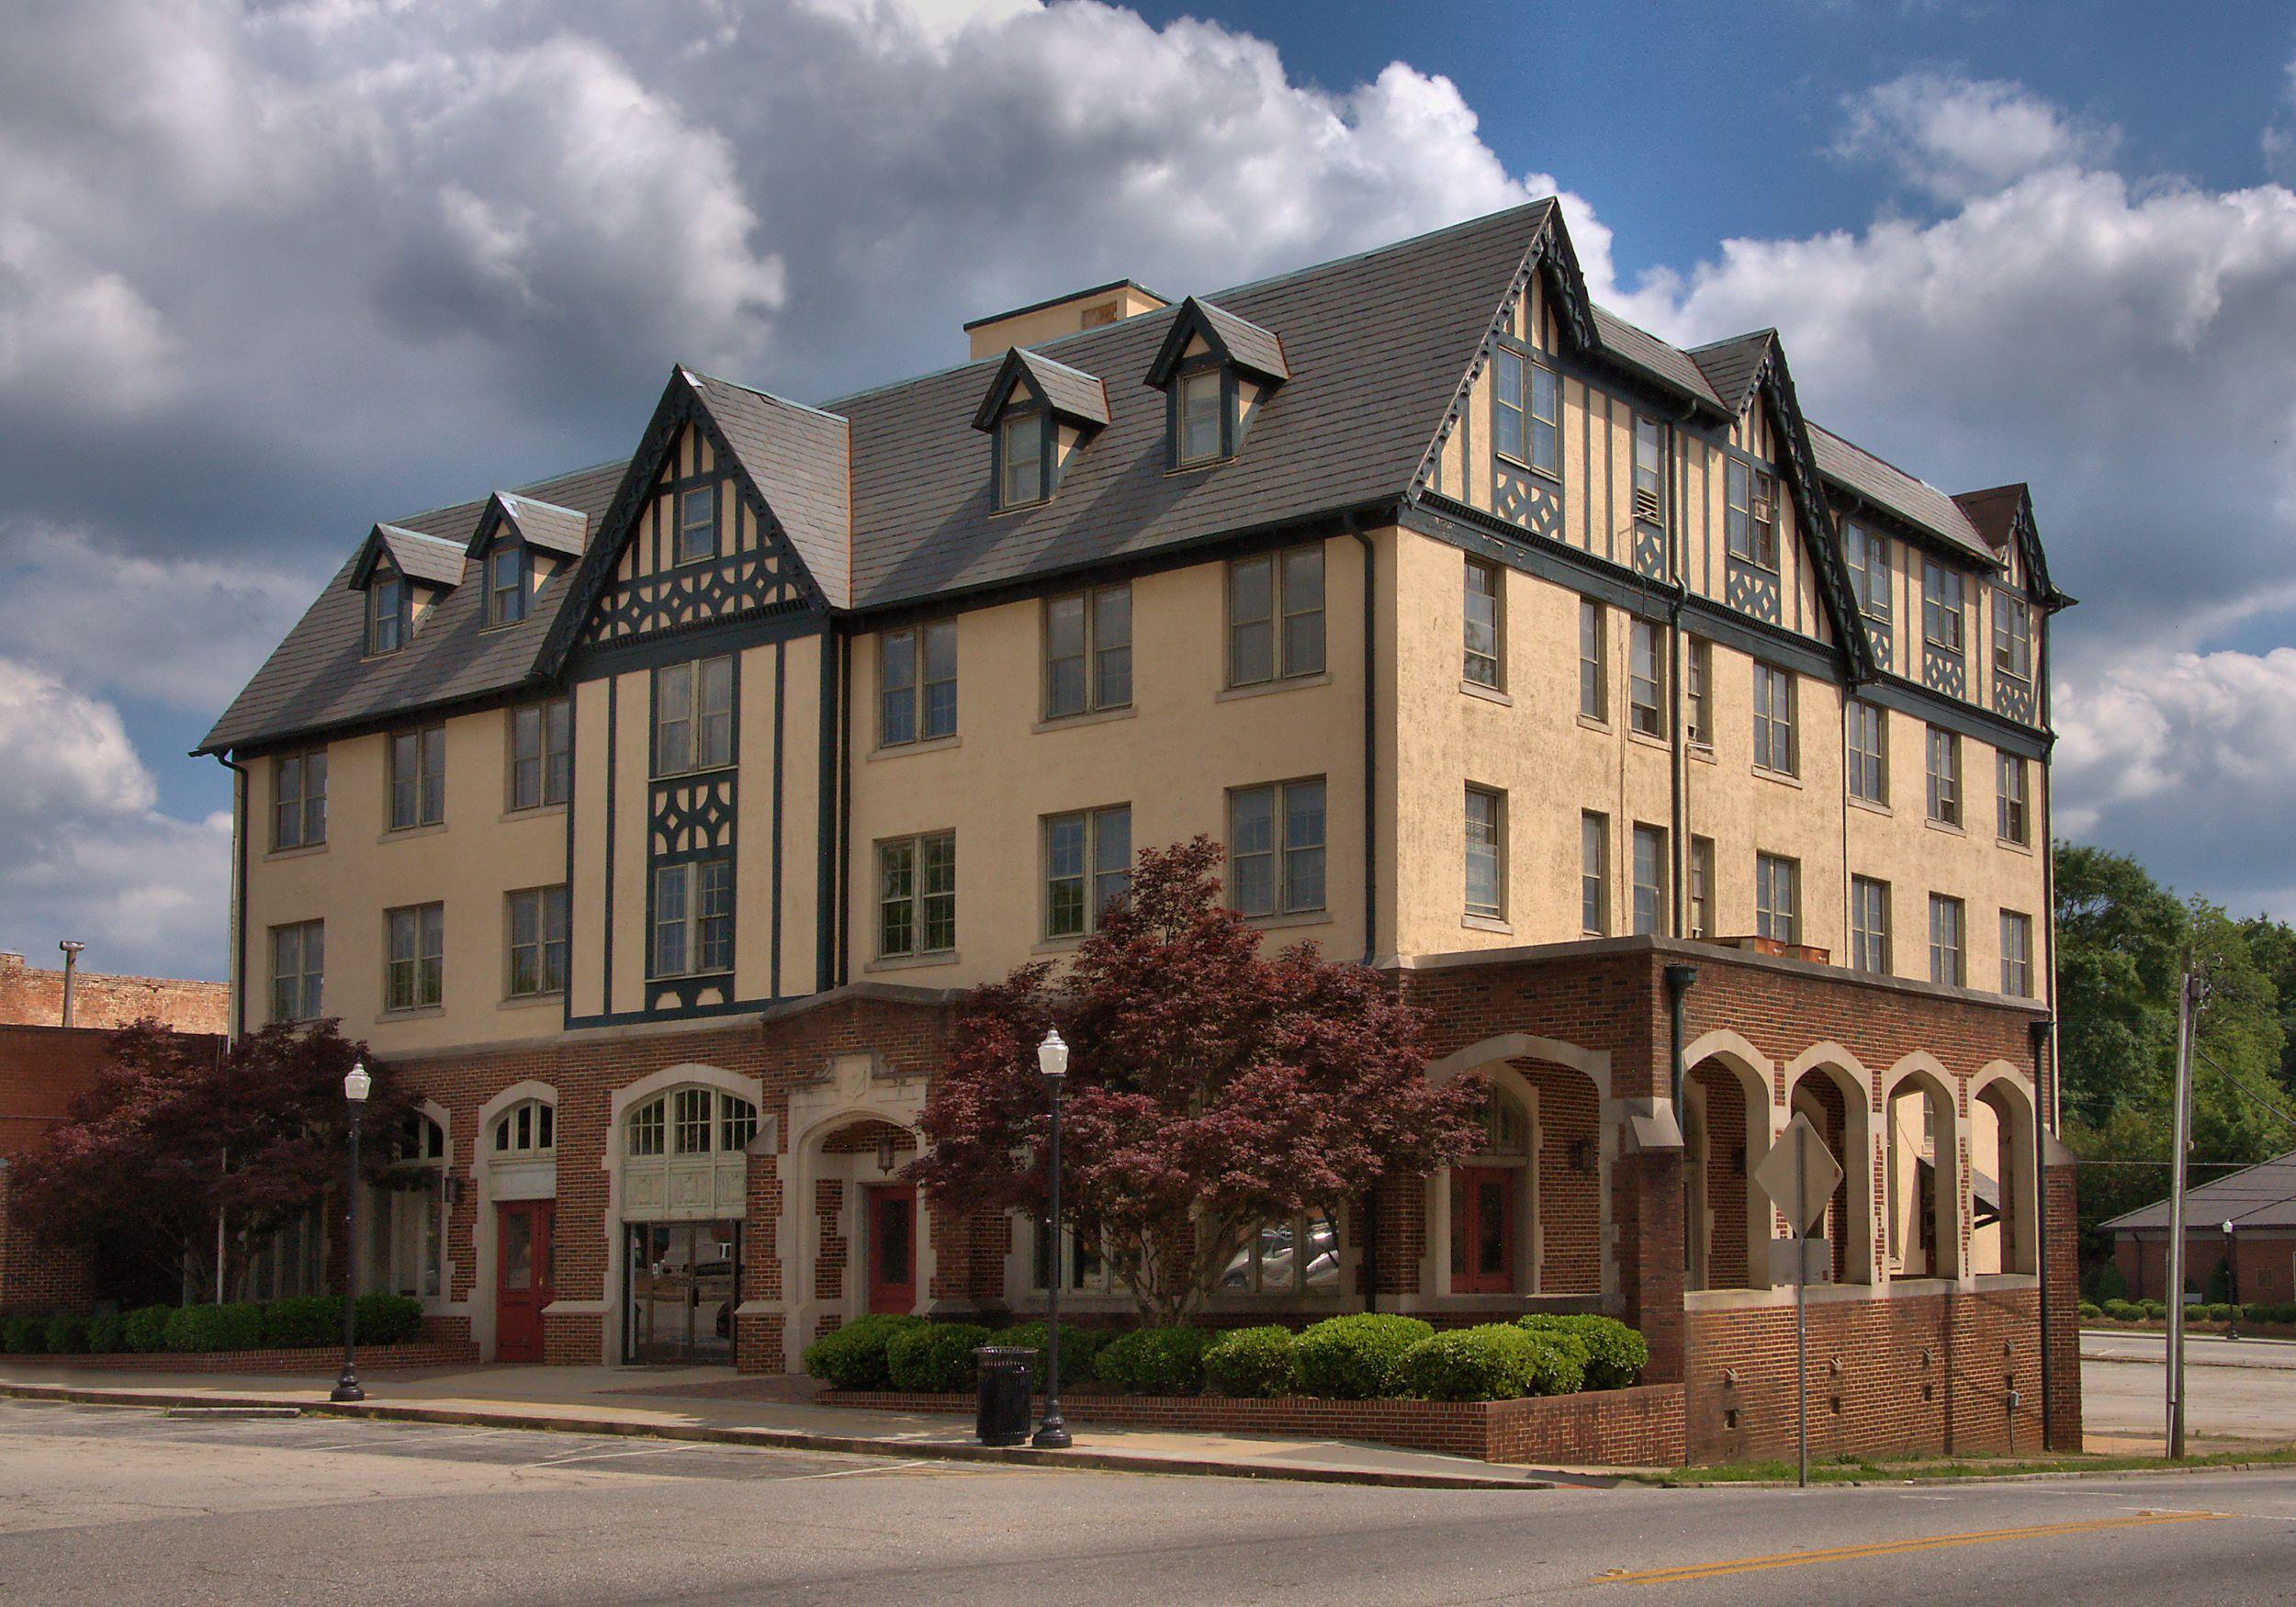 SAMUEL ELBERT HOTEL    ©  Copyright Brian Brown Photography/Vanishing Media USA 2014